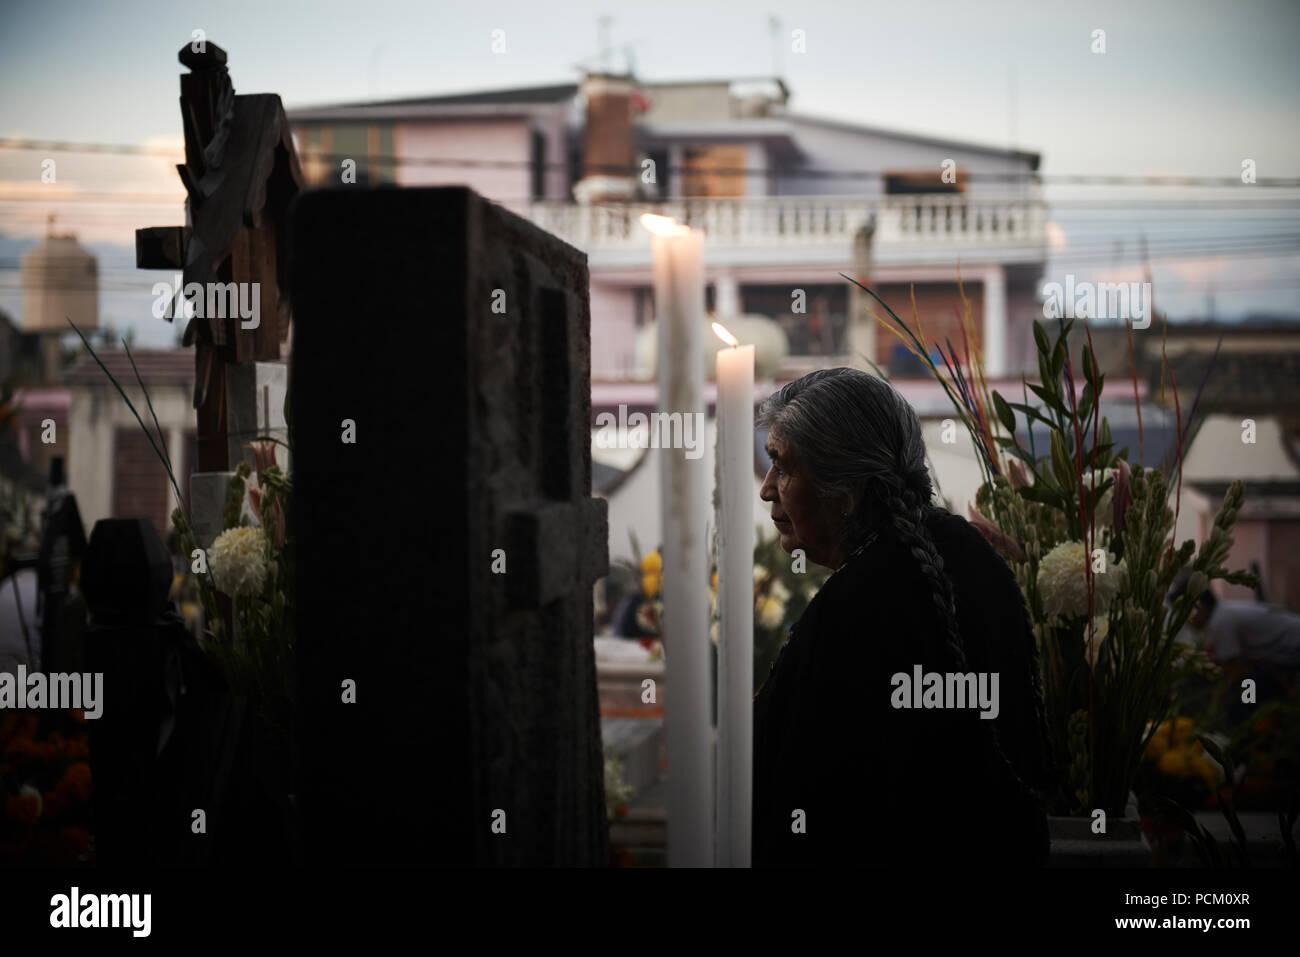 El Dia de Los Muertos.  Day of the dead celebrations in Mexico at the Parroquia de San Andres Apostle, Mixquic. - Stock Image